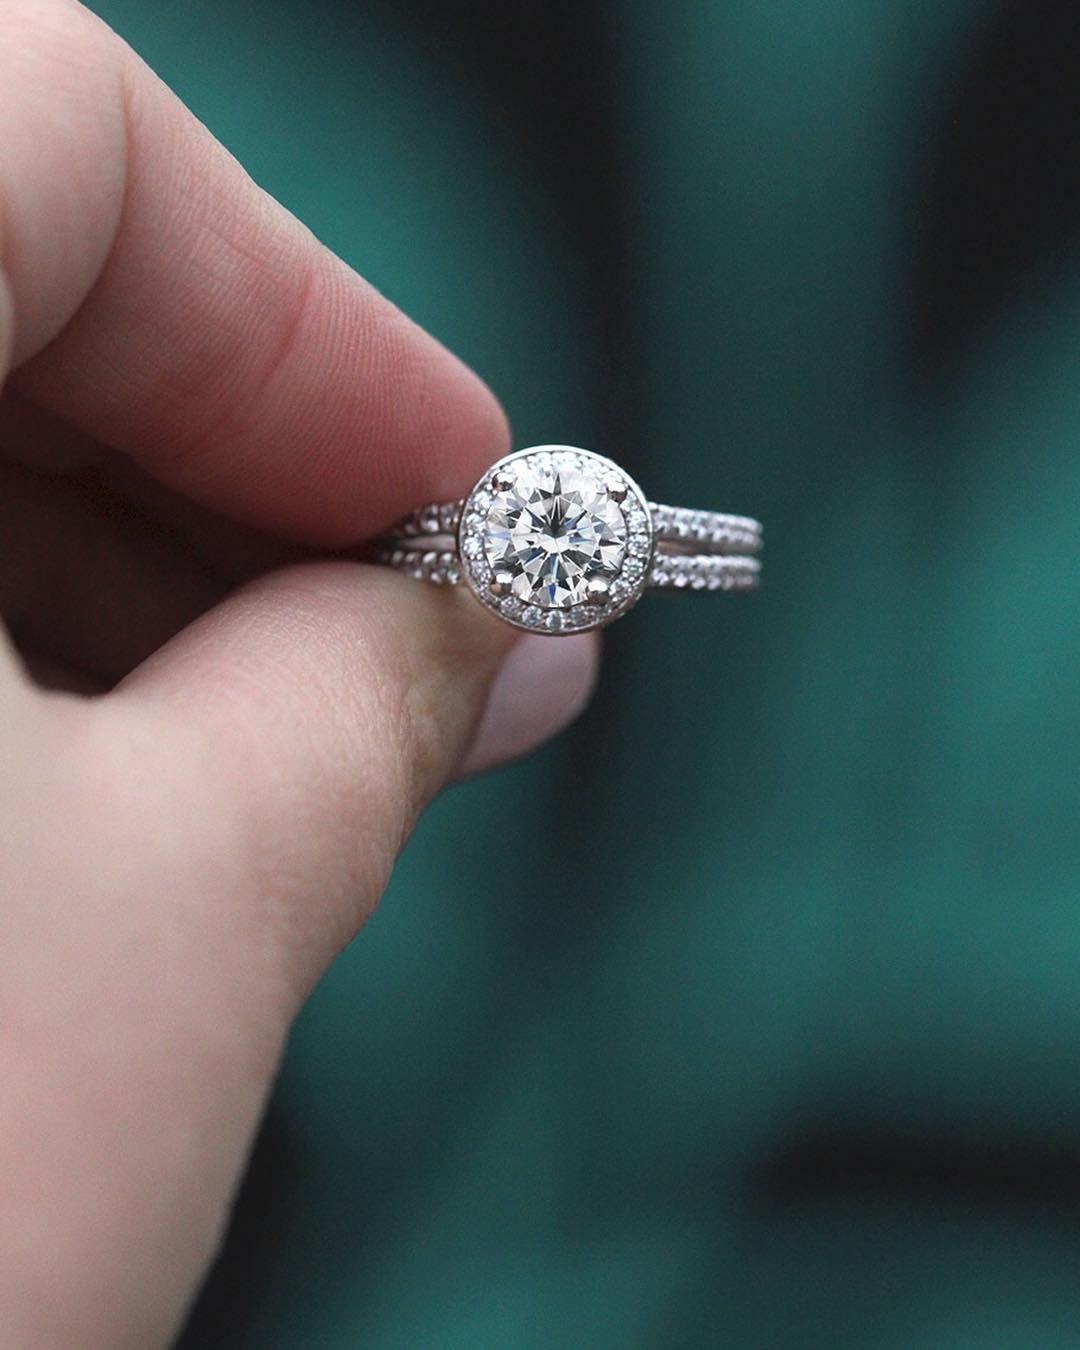 Engagement Rings, Rings, Engagement